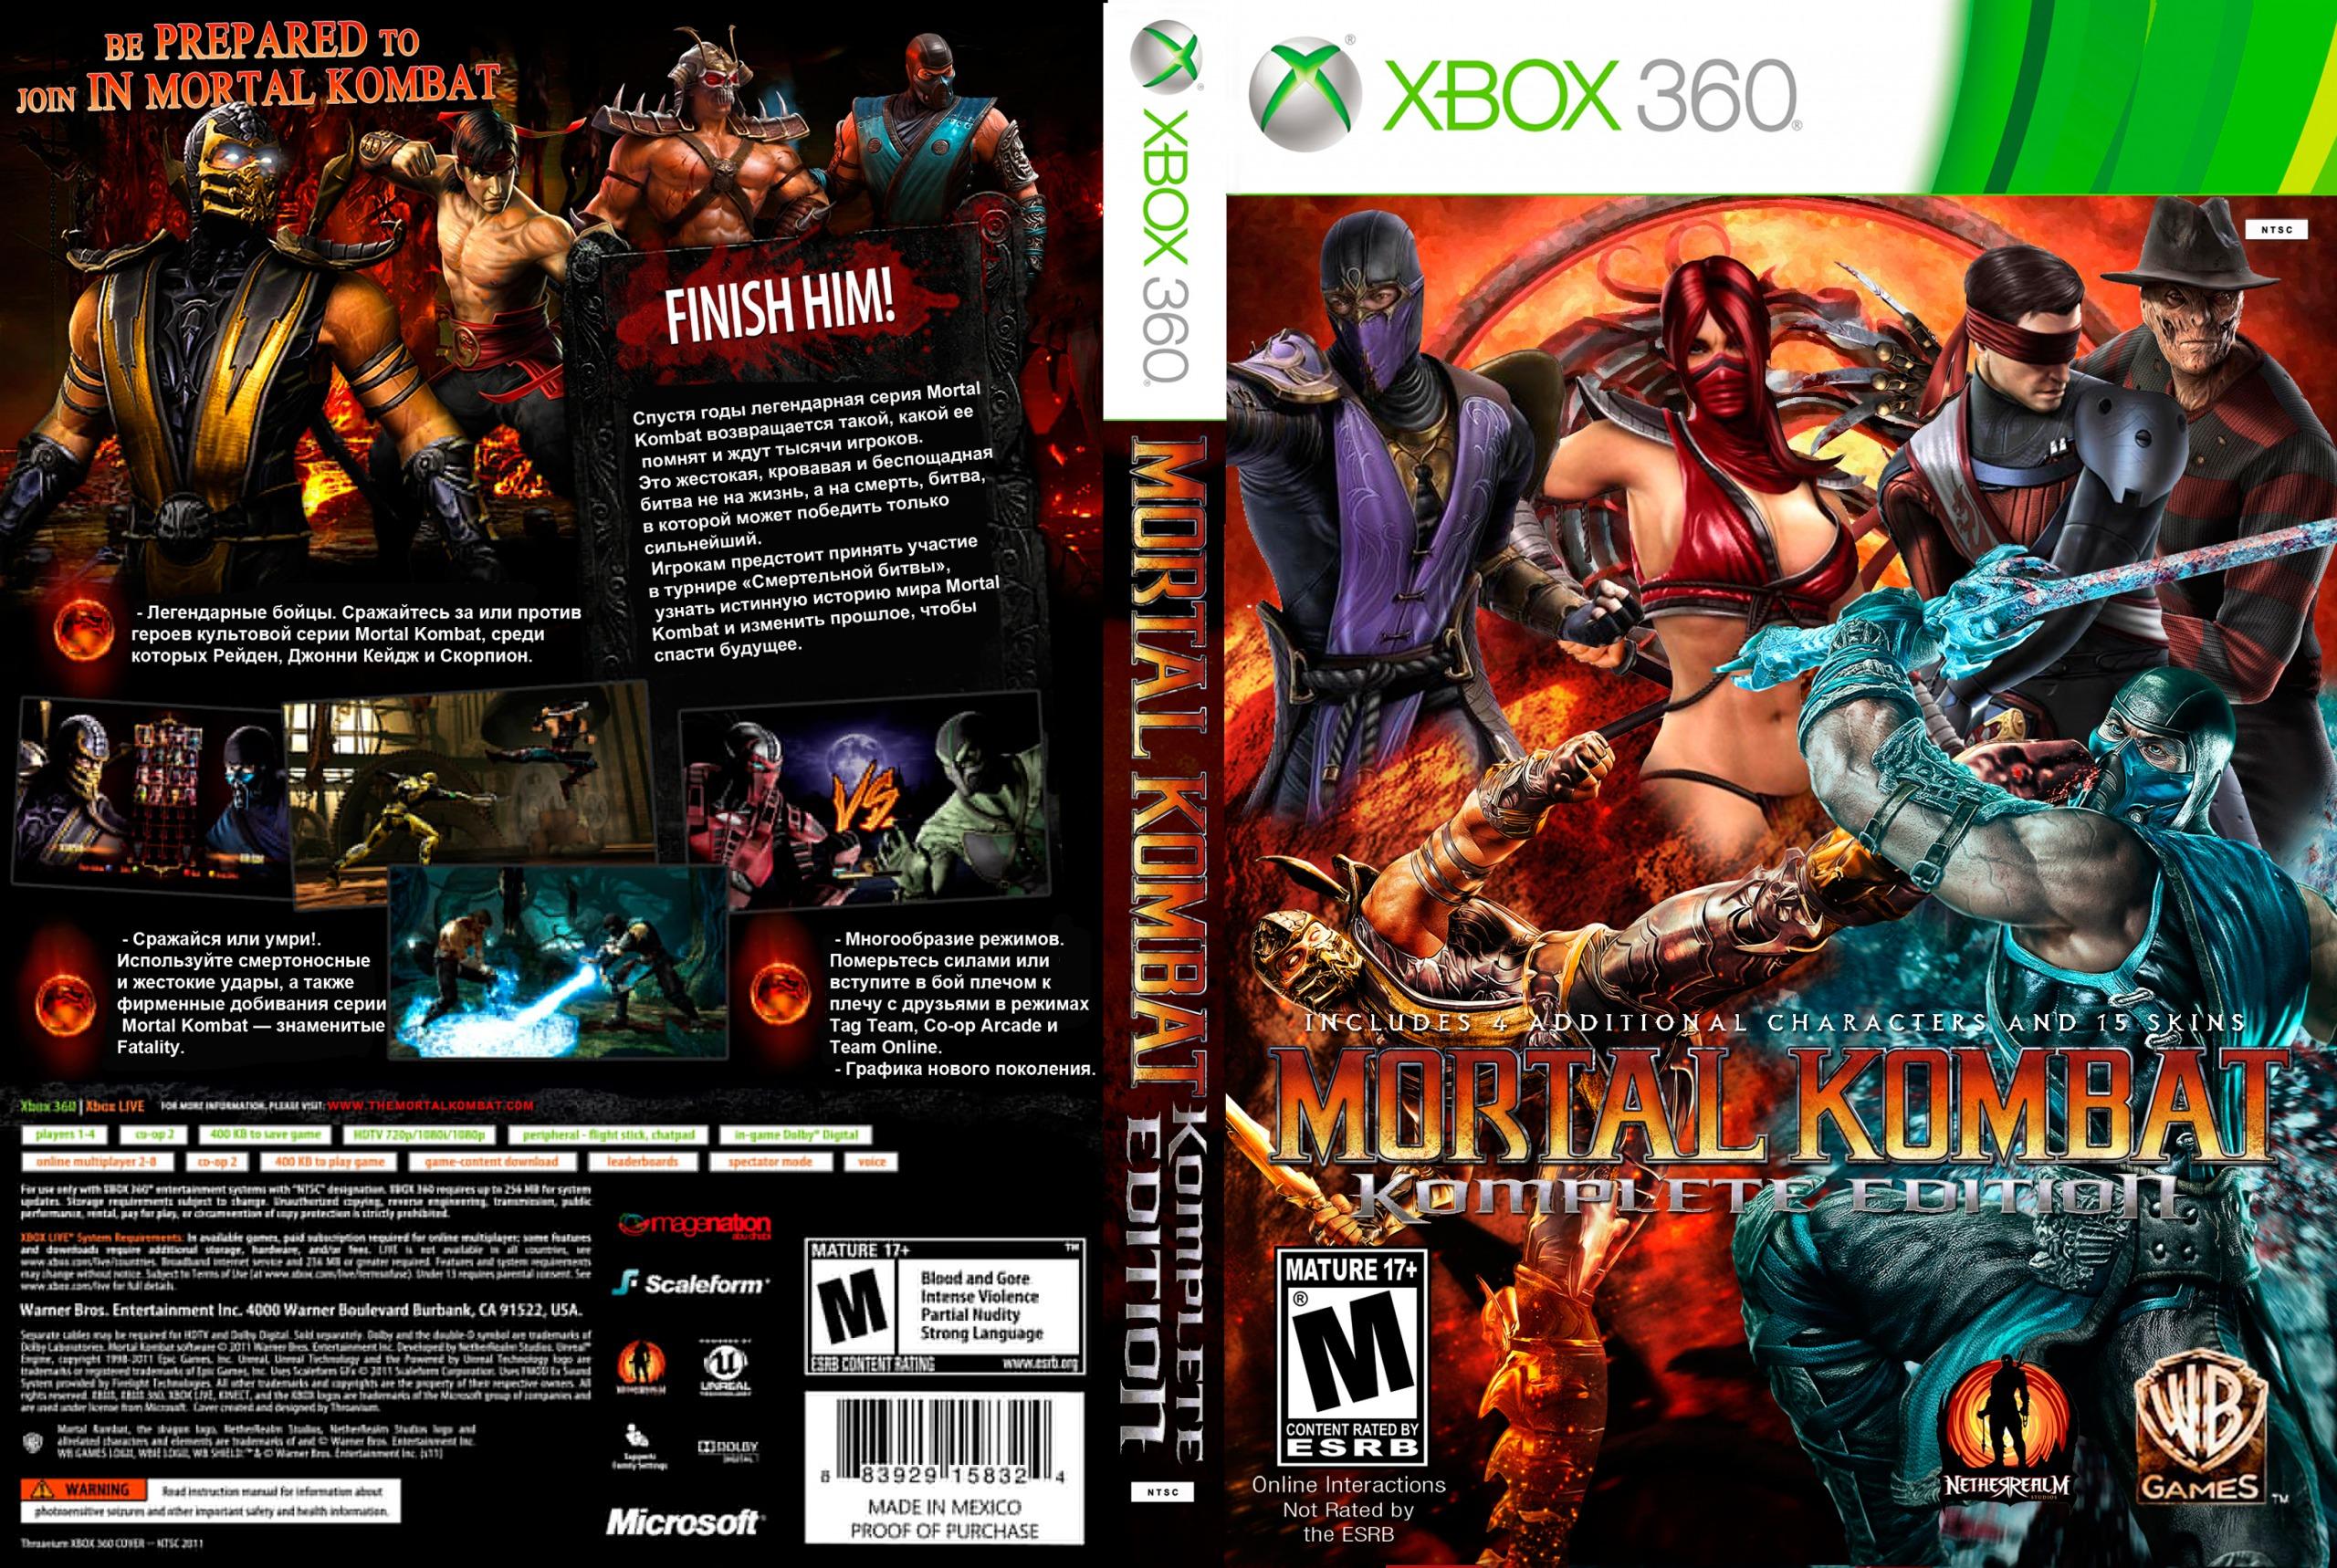 Mortal kombat komplete edition nudity porn gallery